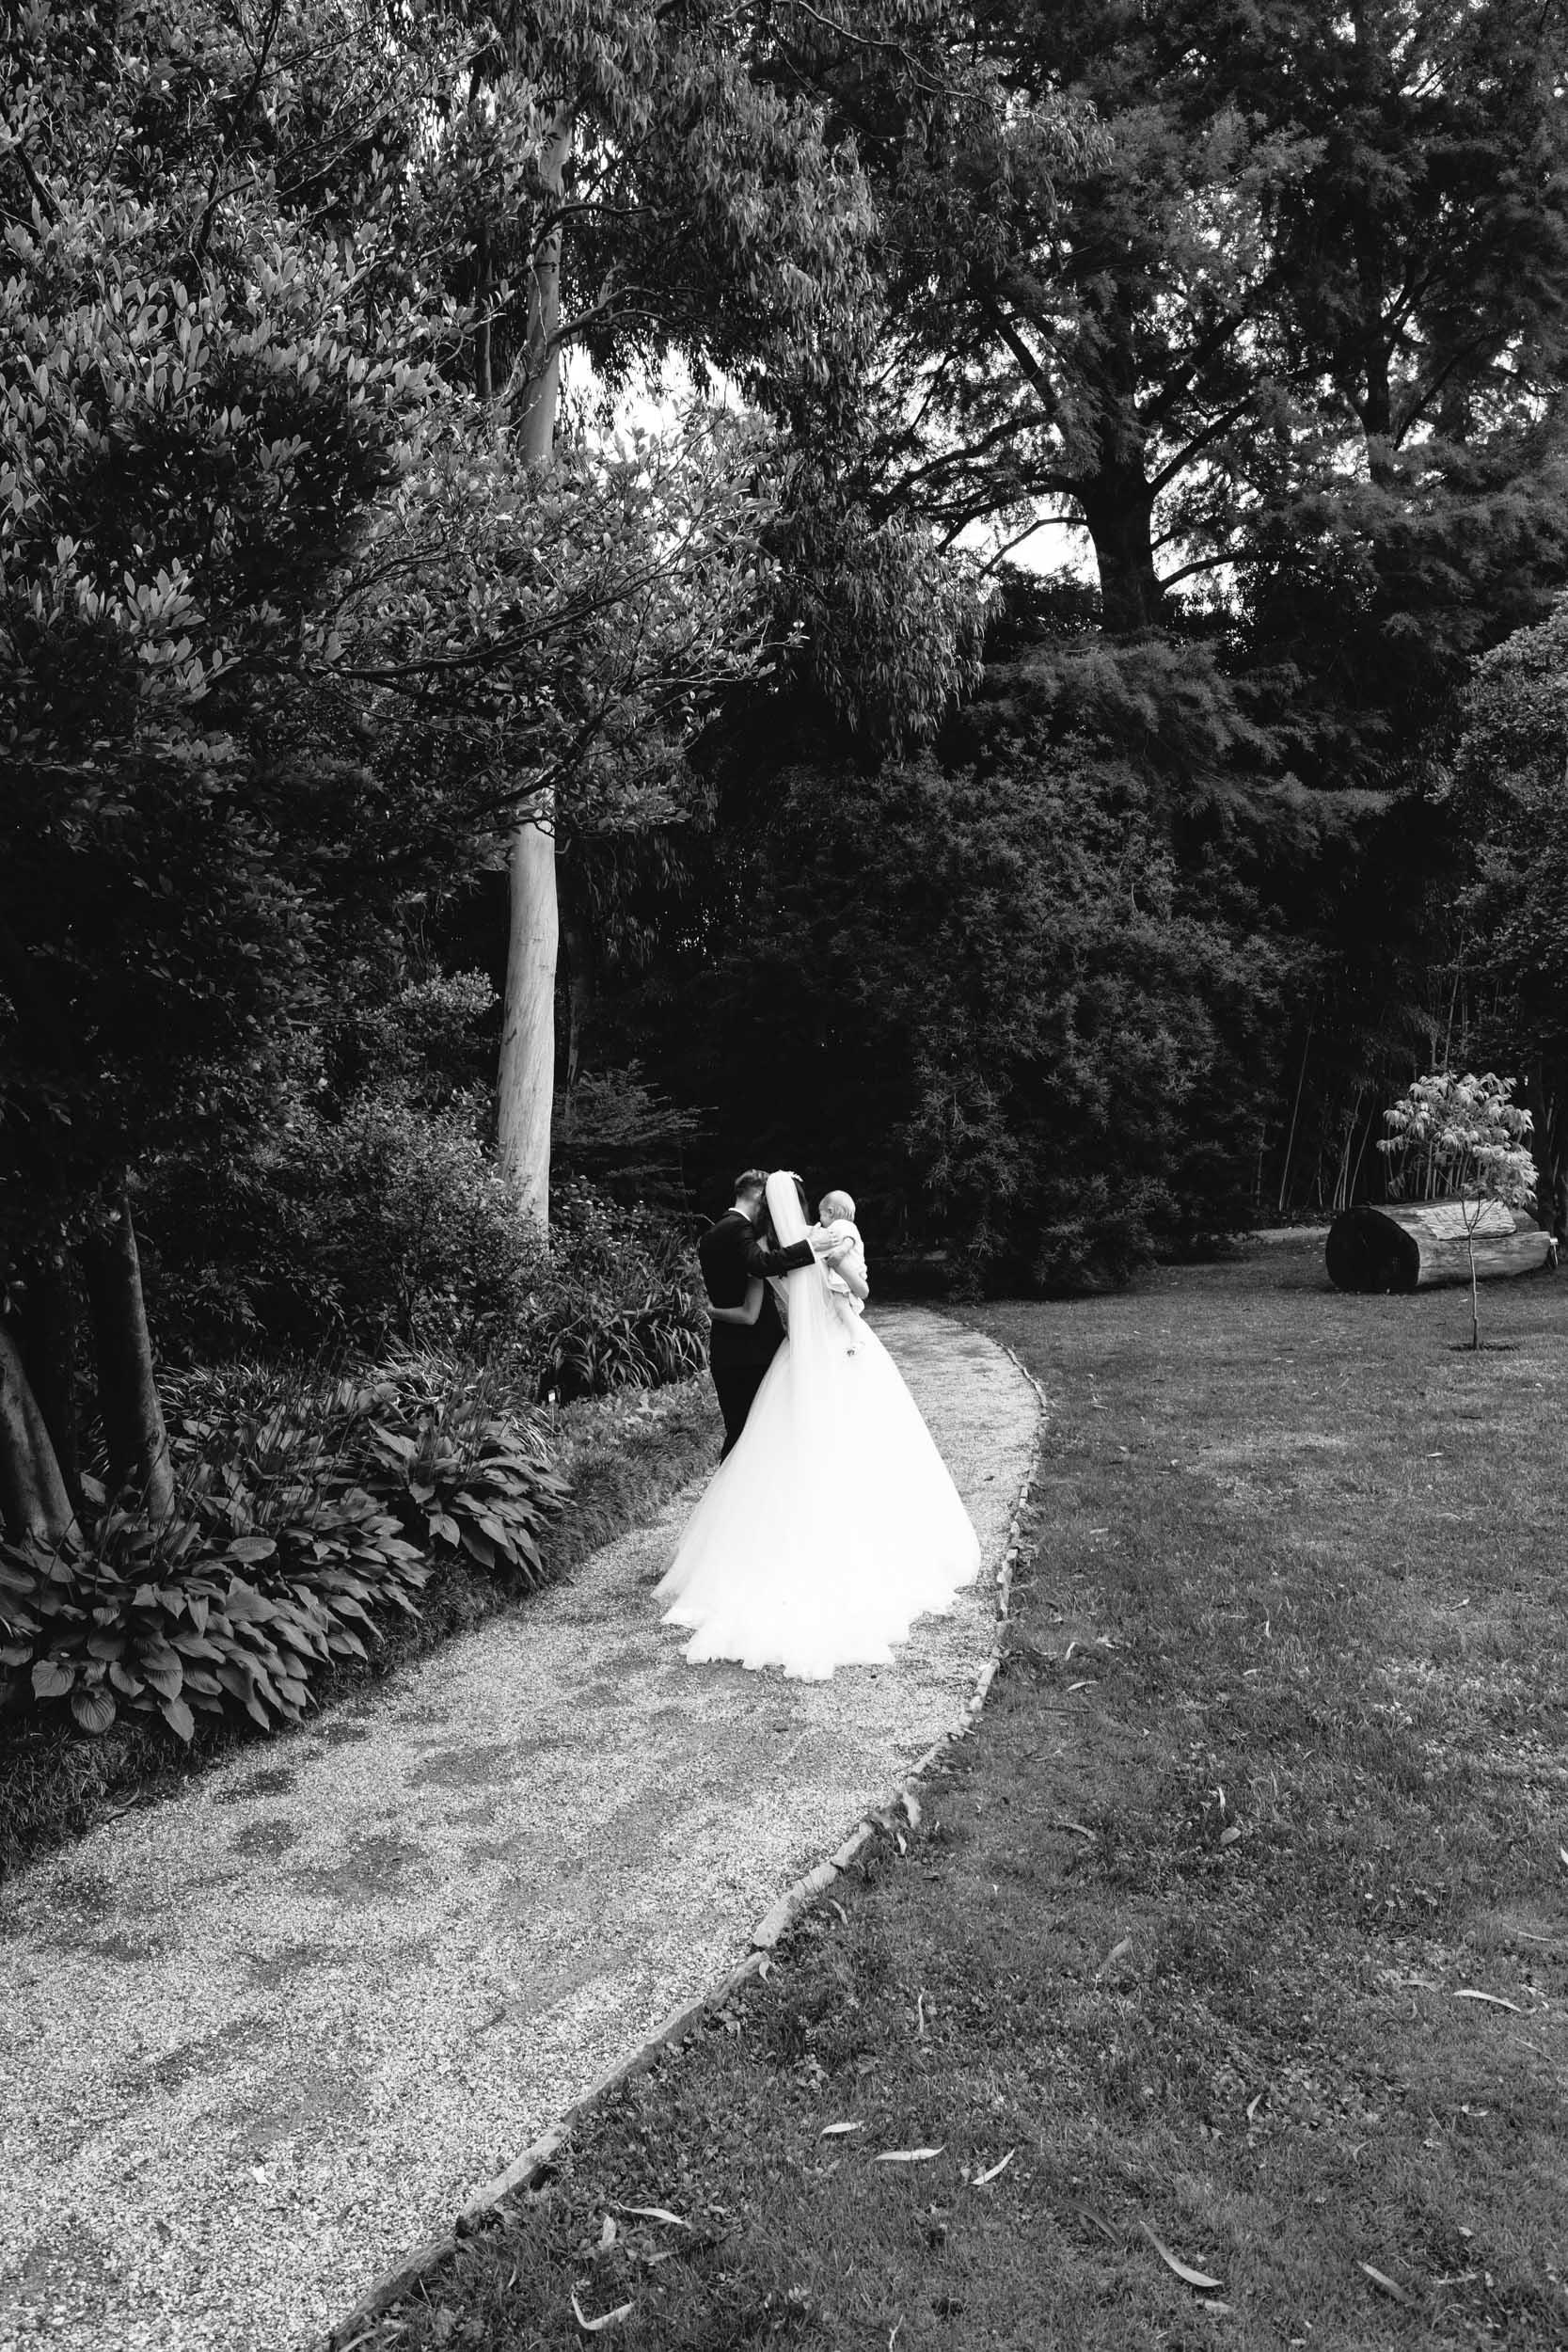 olivia-andreas-wedding-switzerland-328.jpg